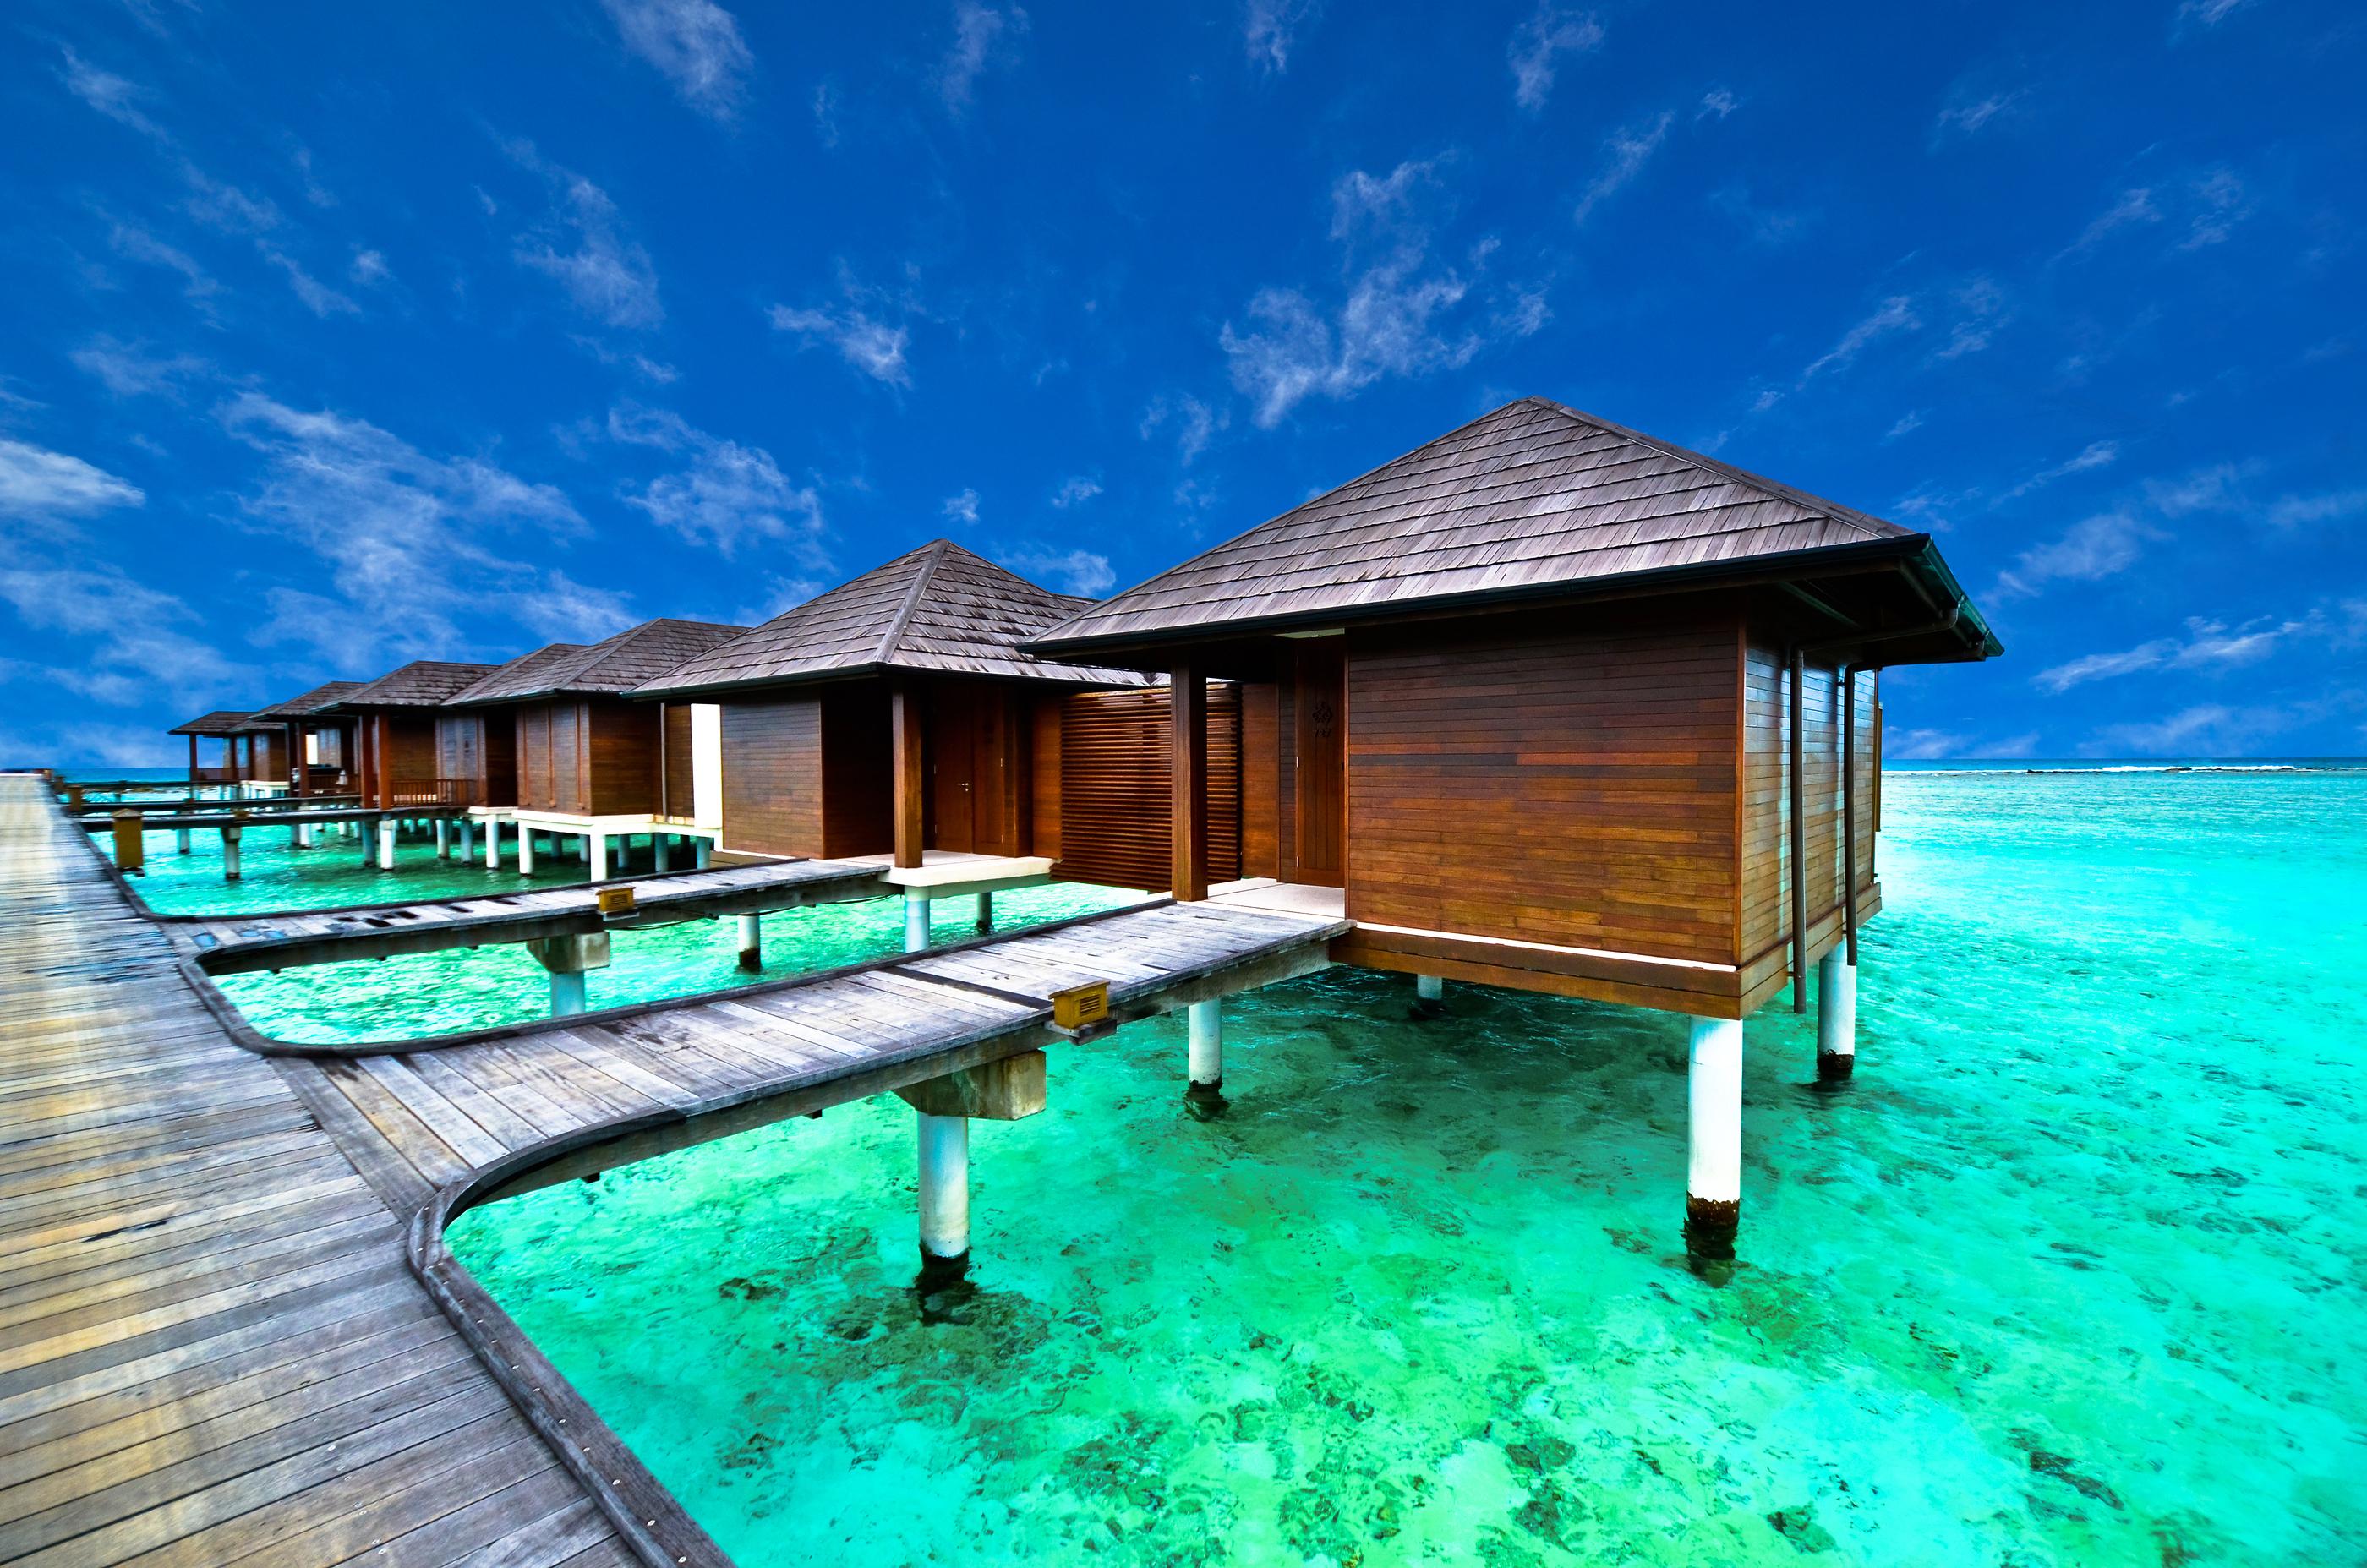 Overwater Bungalows in Tahiti